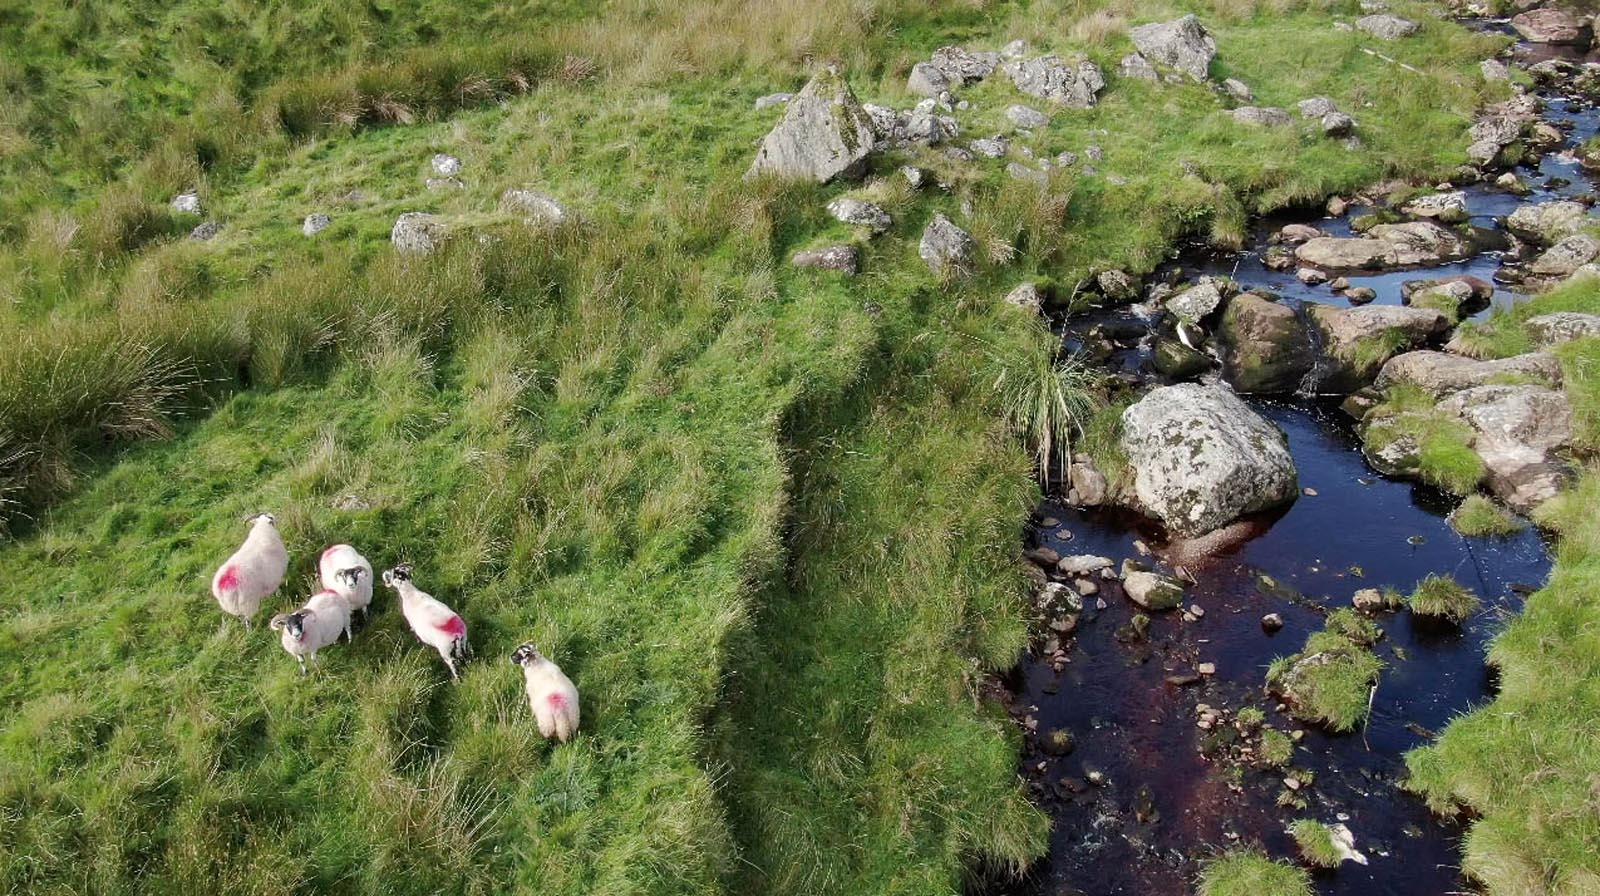 Aerial drone photography and video production services Dublin and Ireland portfolio - screenshot 2 of Cushendun video